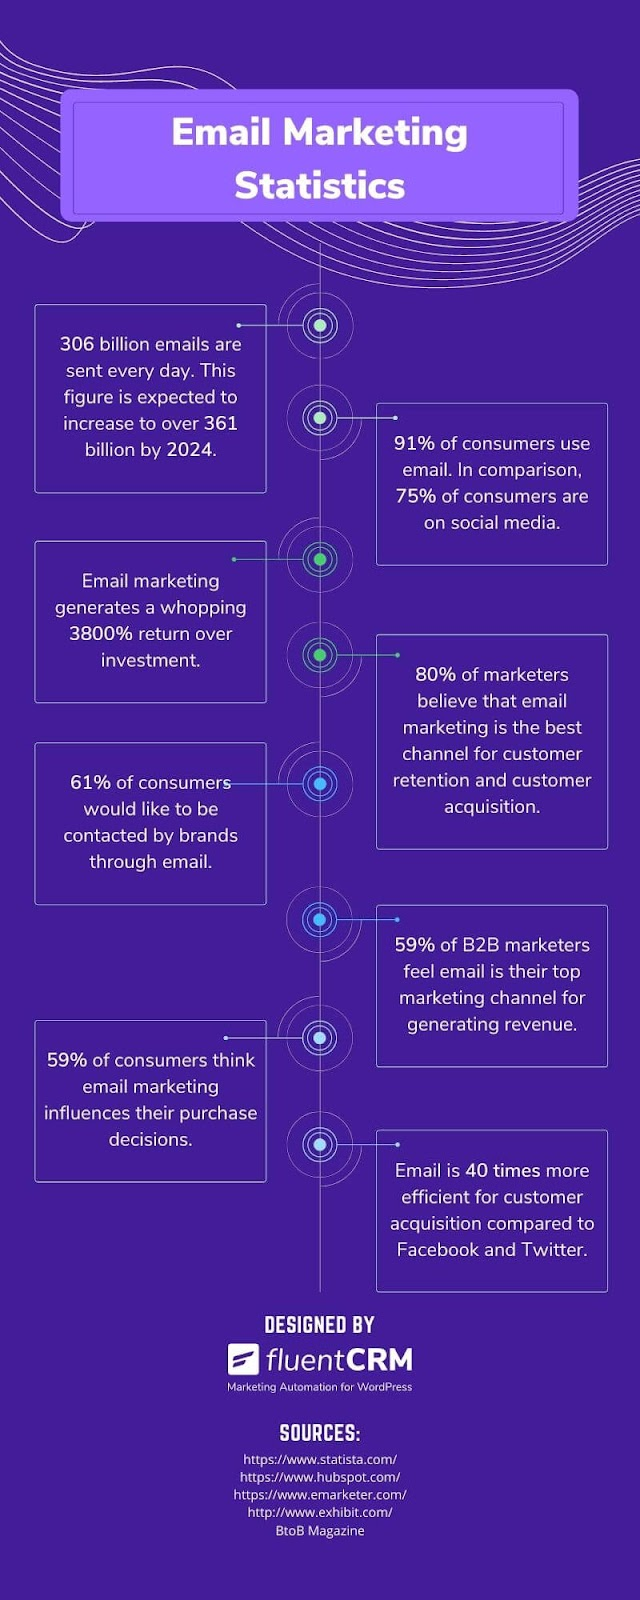 email marketing statistics, email marketing infographic, email marketing stats, email marketing